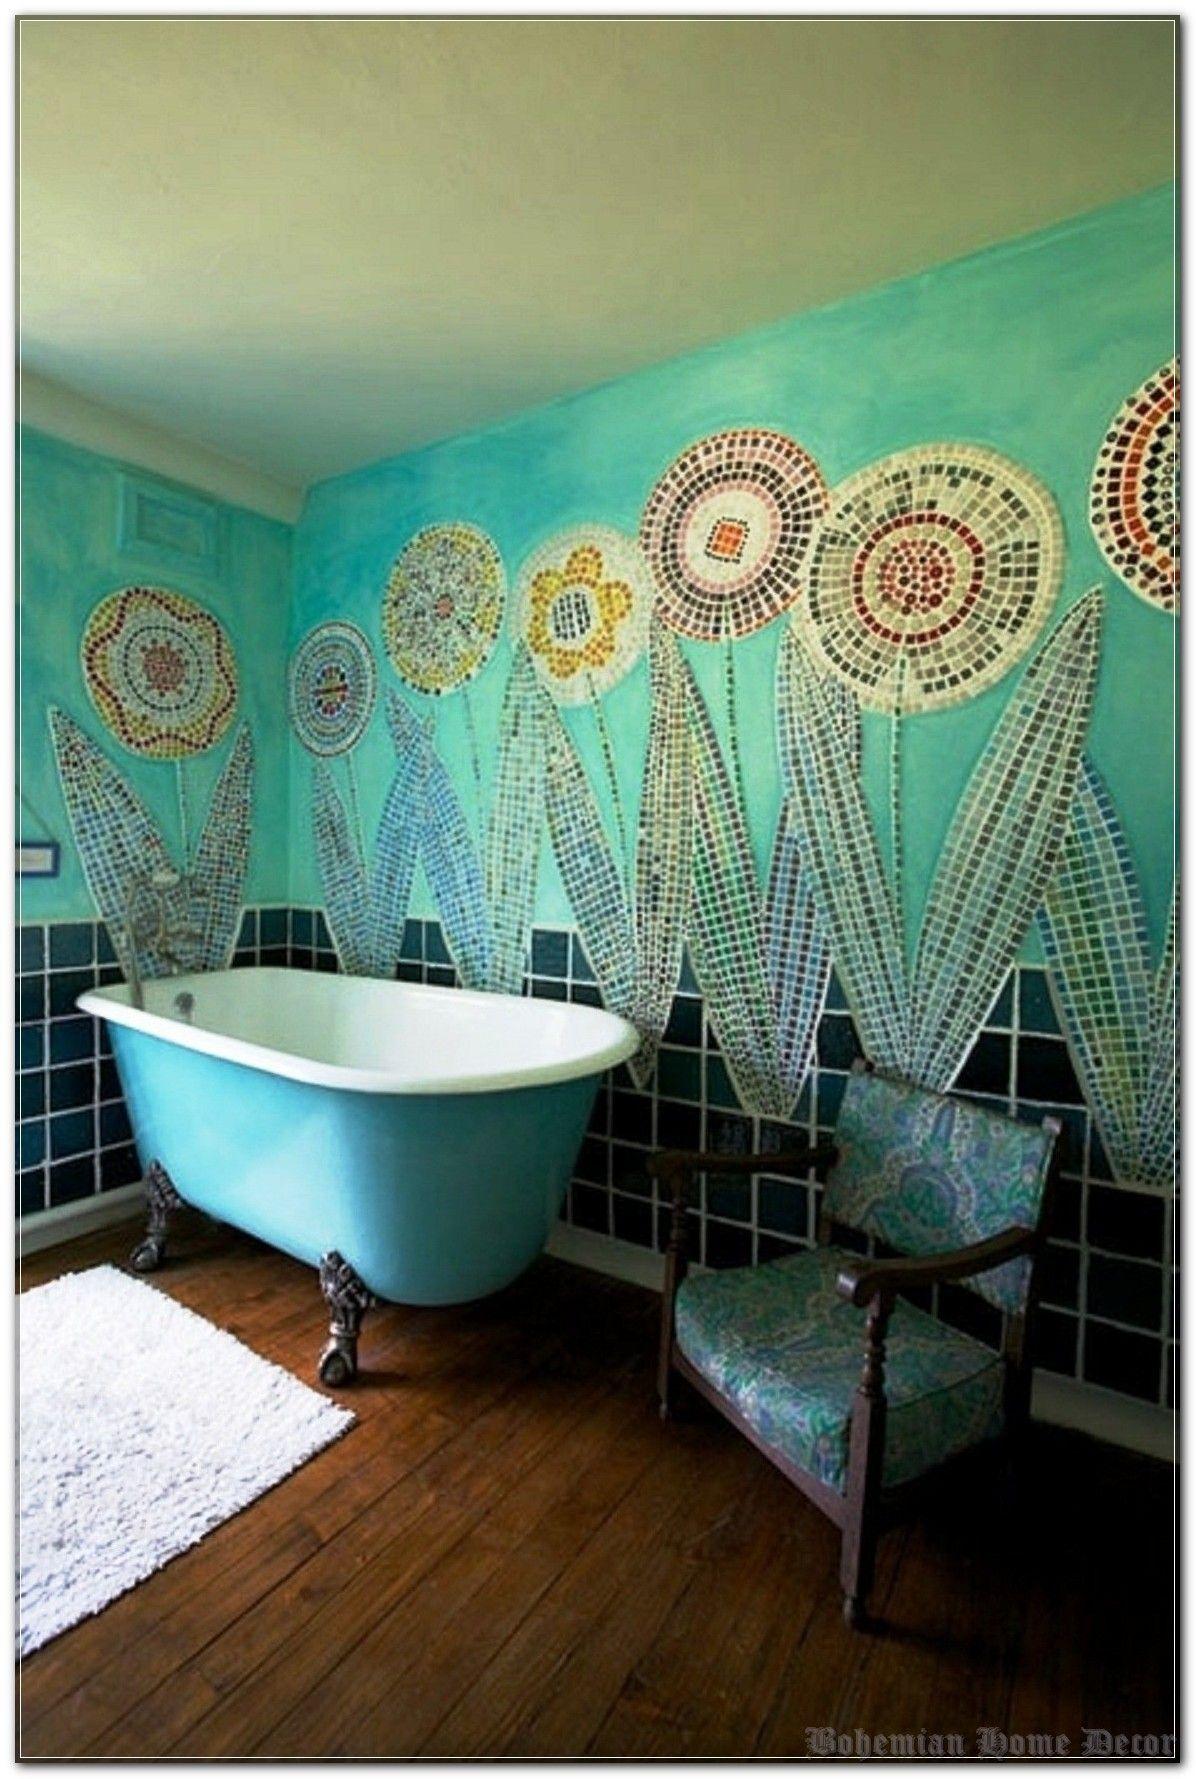 7 Things I Would Do If I'd Start Again Bohemian Home Decor